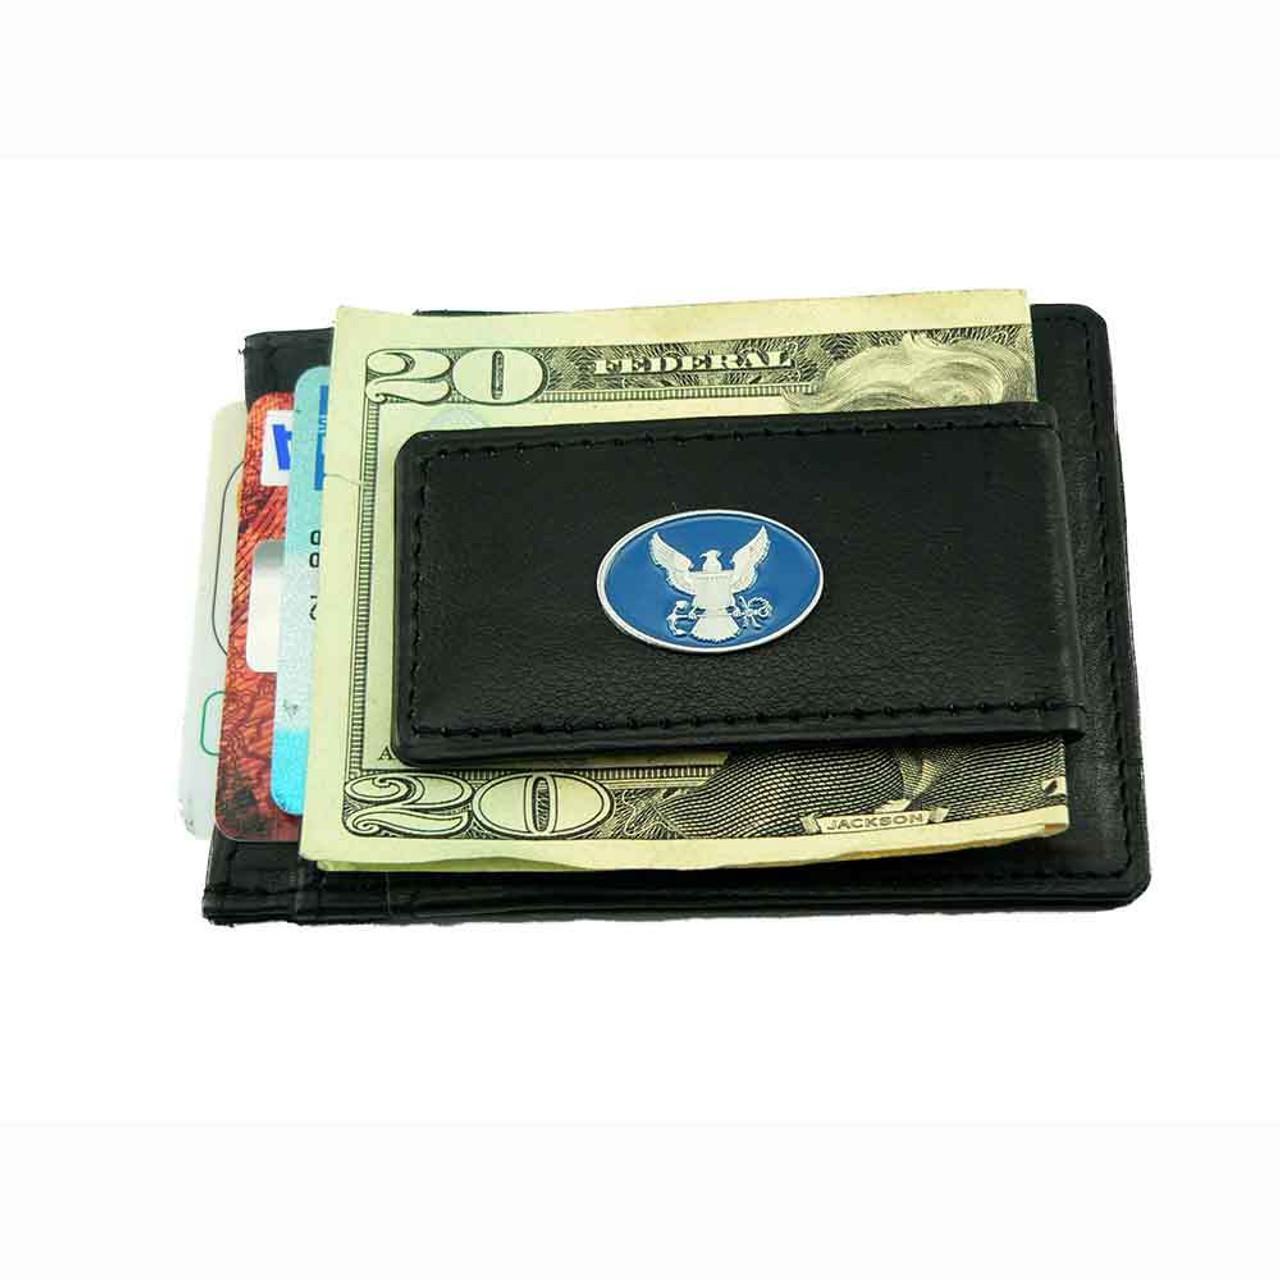 u s navy slimline leather money clip card holder wallet - Money Clip Card Holder